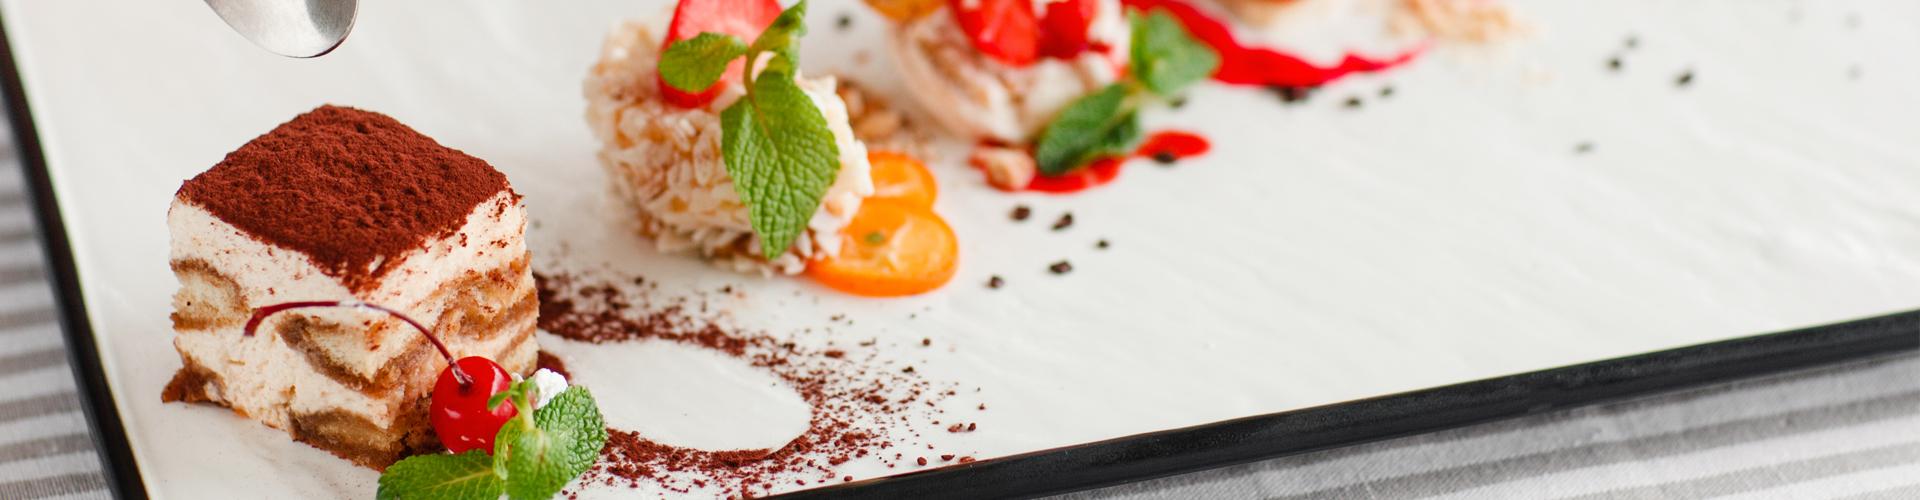 menu-paviljoen-schipluiden-dessert-